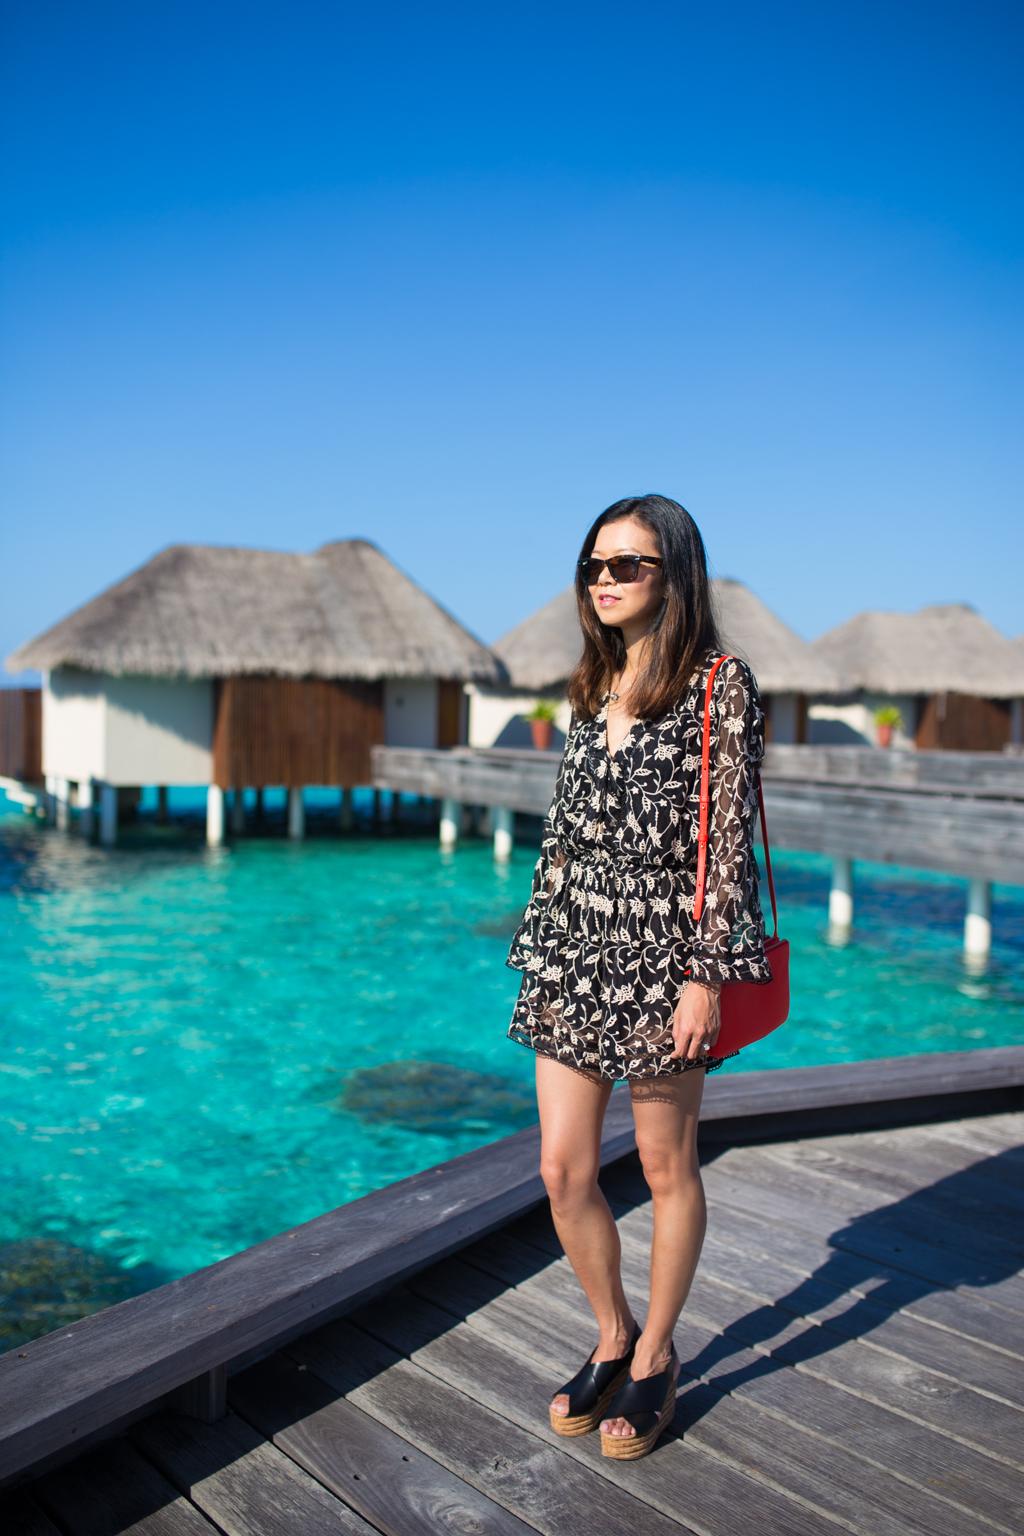 startwithblack maldives 14-3